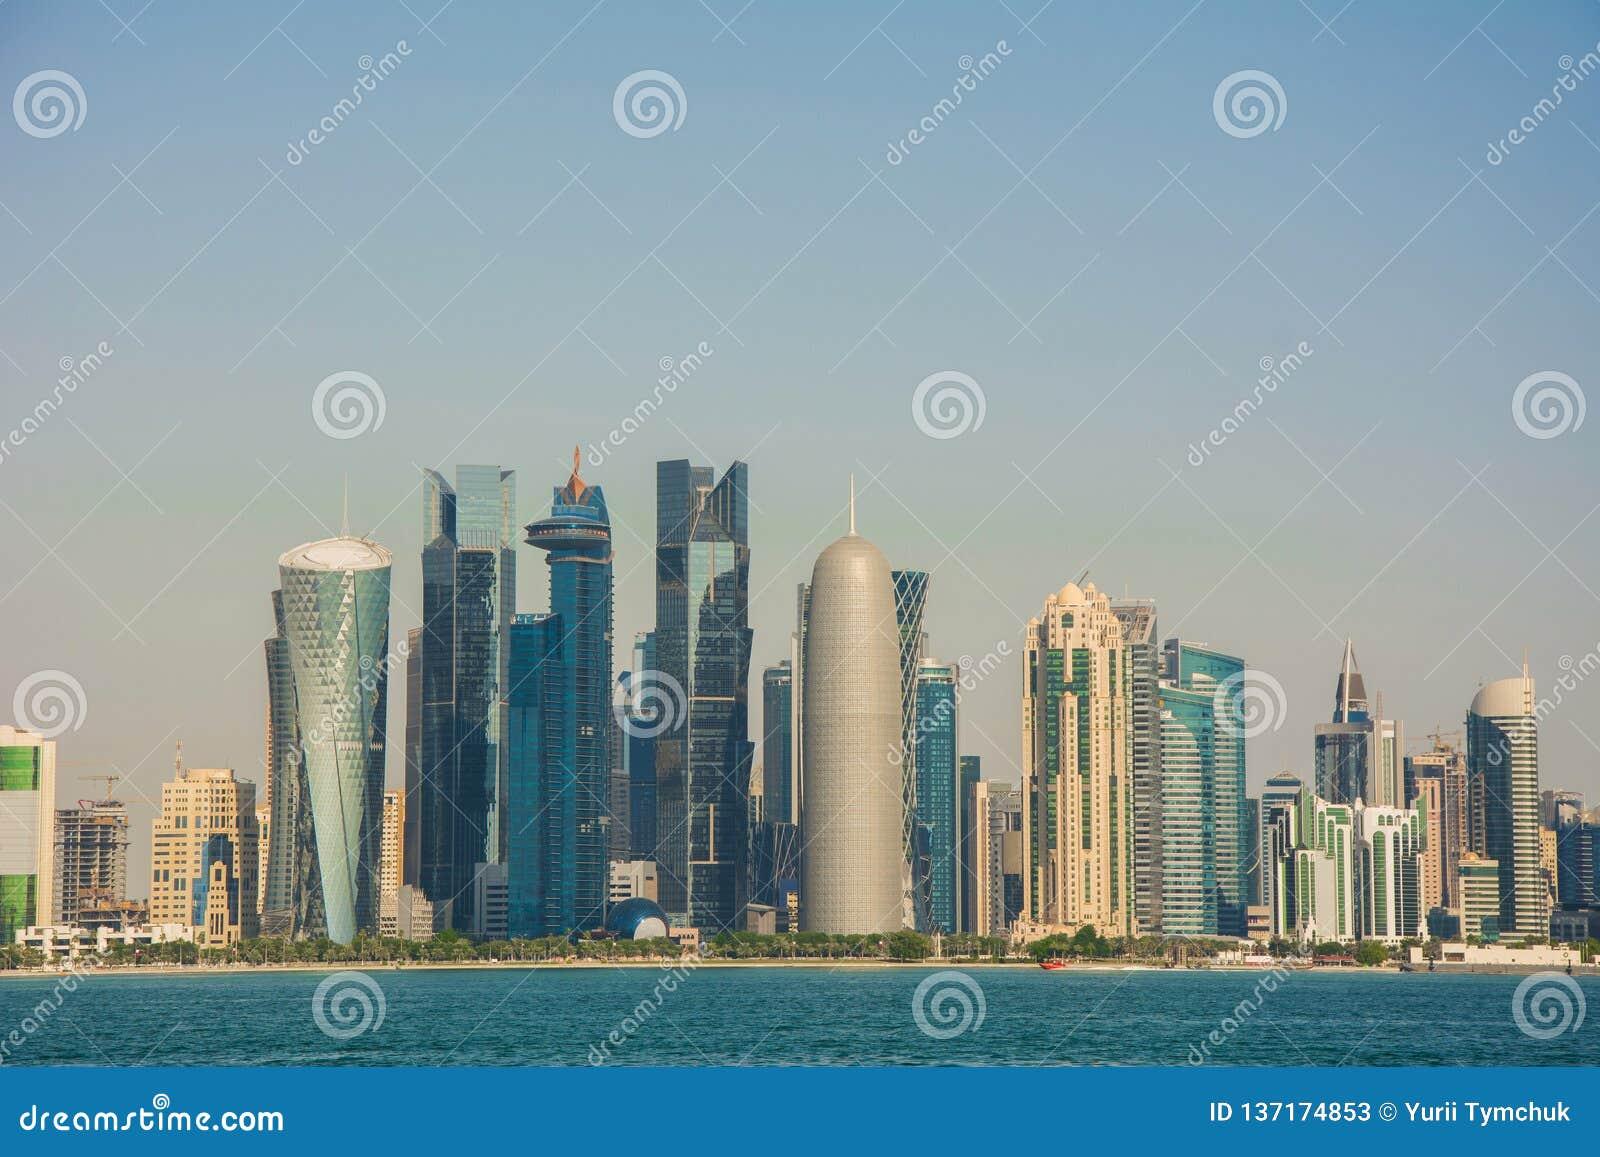 Futuristic urban skyline of Doha, largest city of the Arab state of Qatar